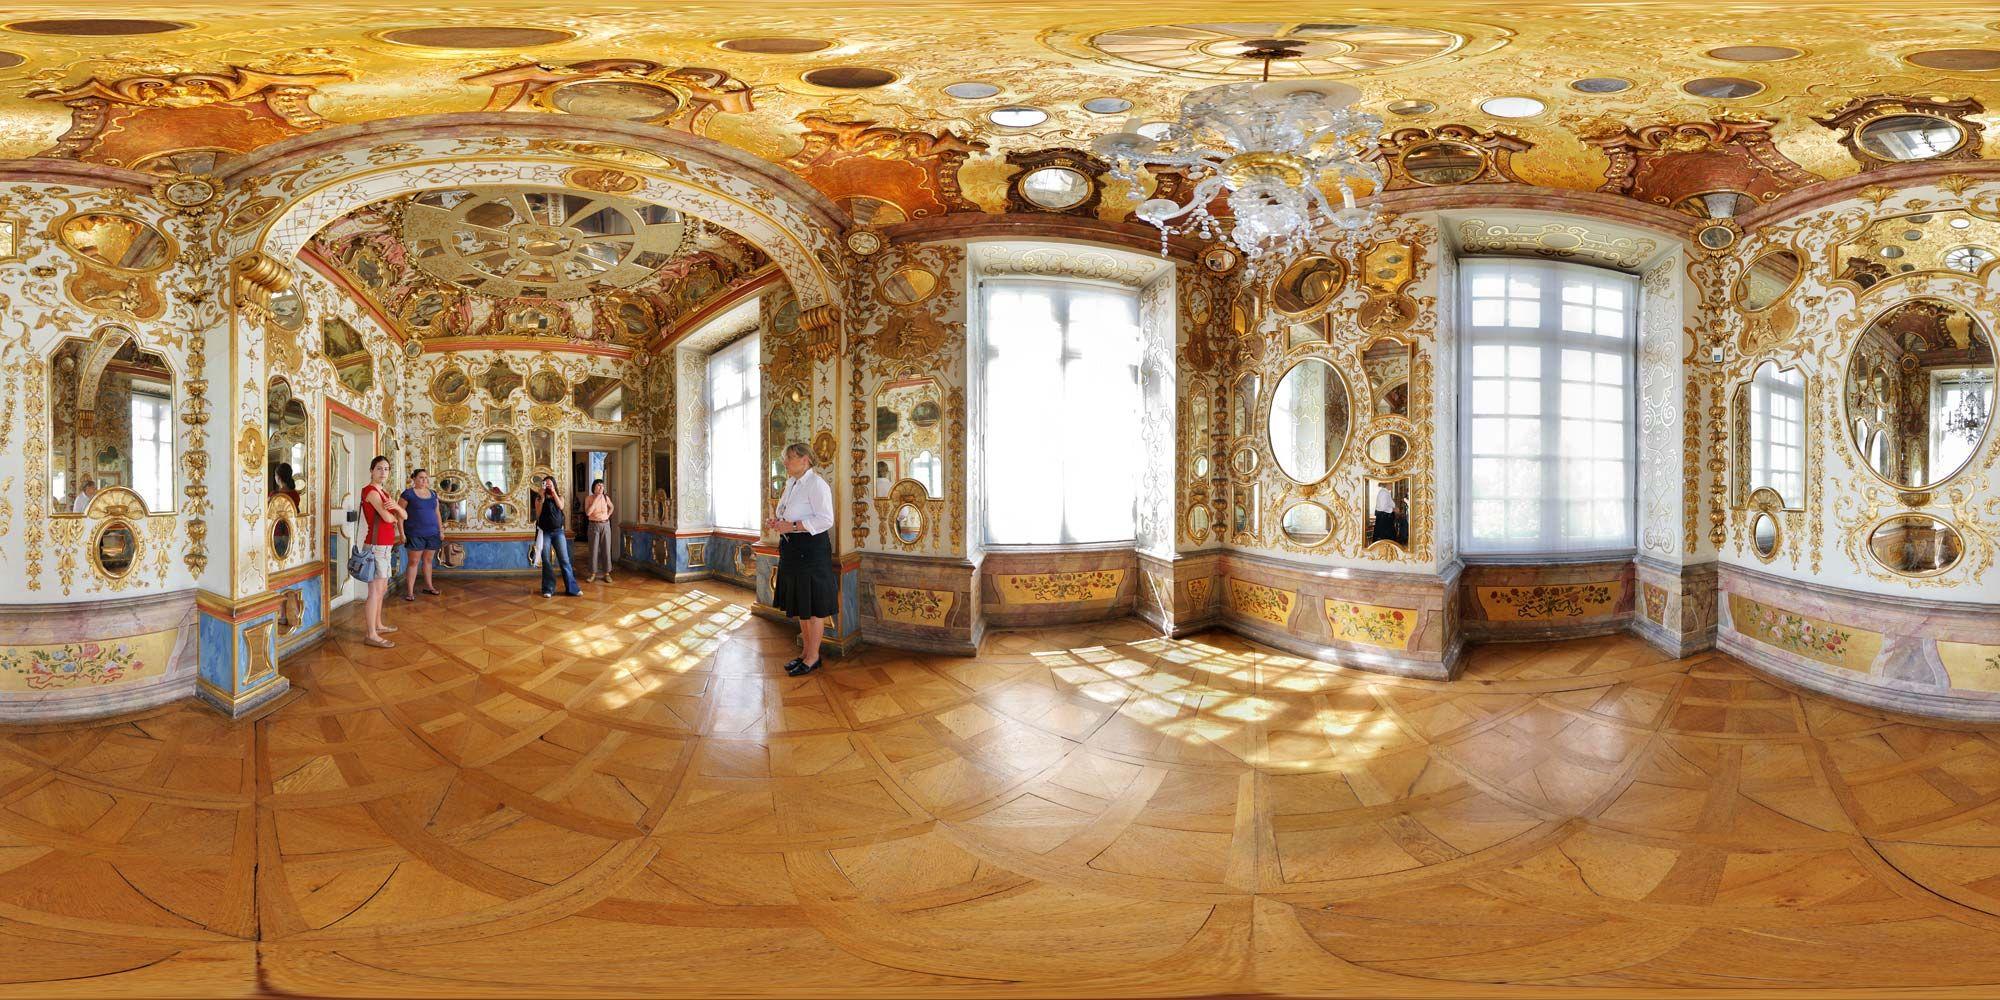 kubische panoramen panorama foto schloss ludwigsburg spiegelkabinett earth 39 s beauty. Black Bedroom Furniture Sets. Home Design Ideas